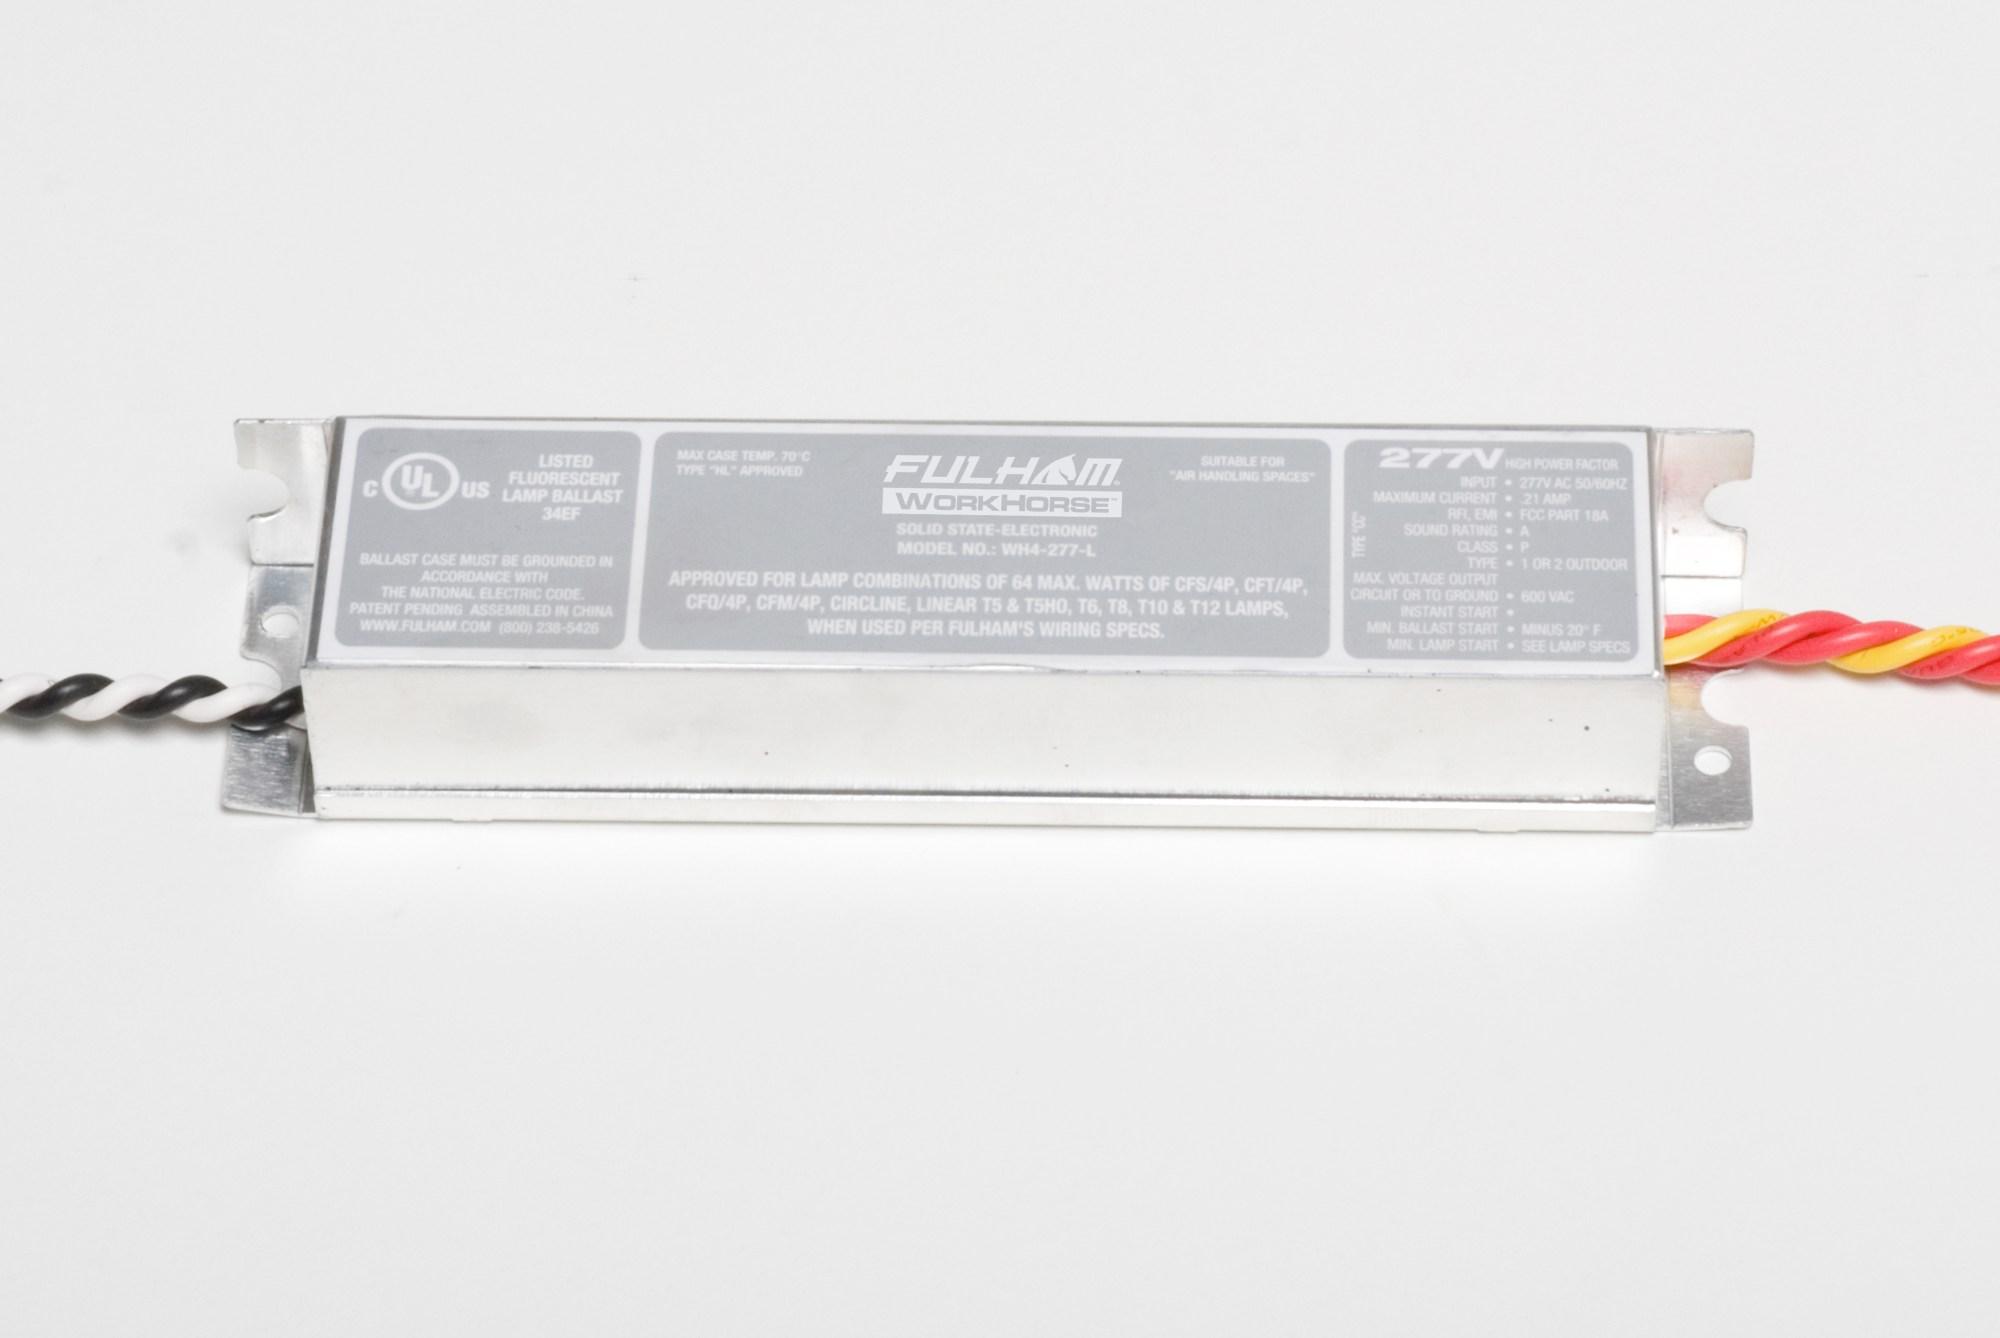 hight resolution of  t6 fulham workhorse ballast wiring diagram fluorescent light on t5 fixture wiring